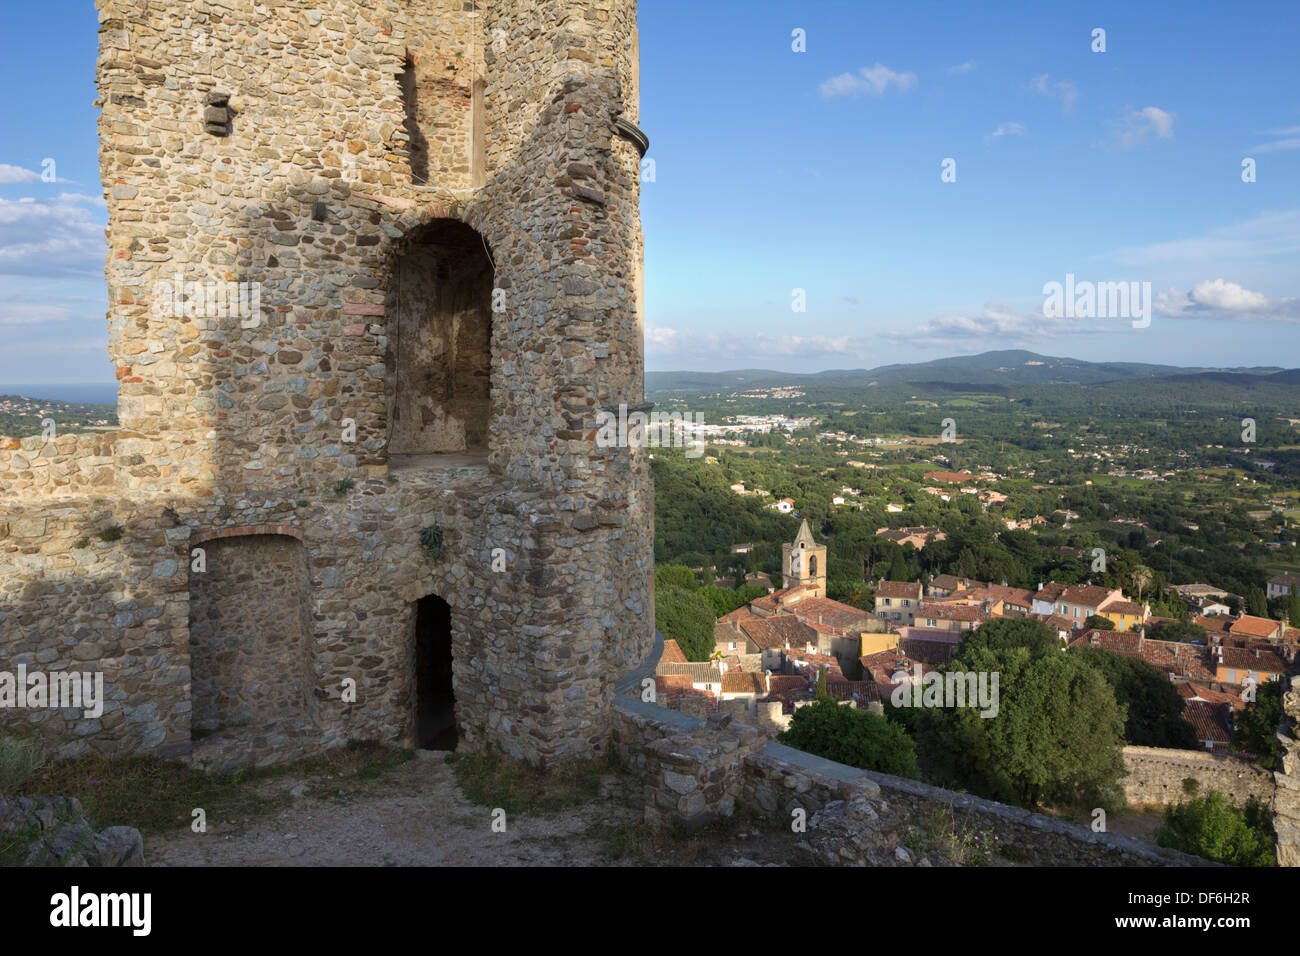 Ruins of castle and village, Grimaud, Var, Provence-Alpes-Cote d'Azur, France, Europe - Stock Image